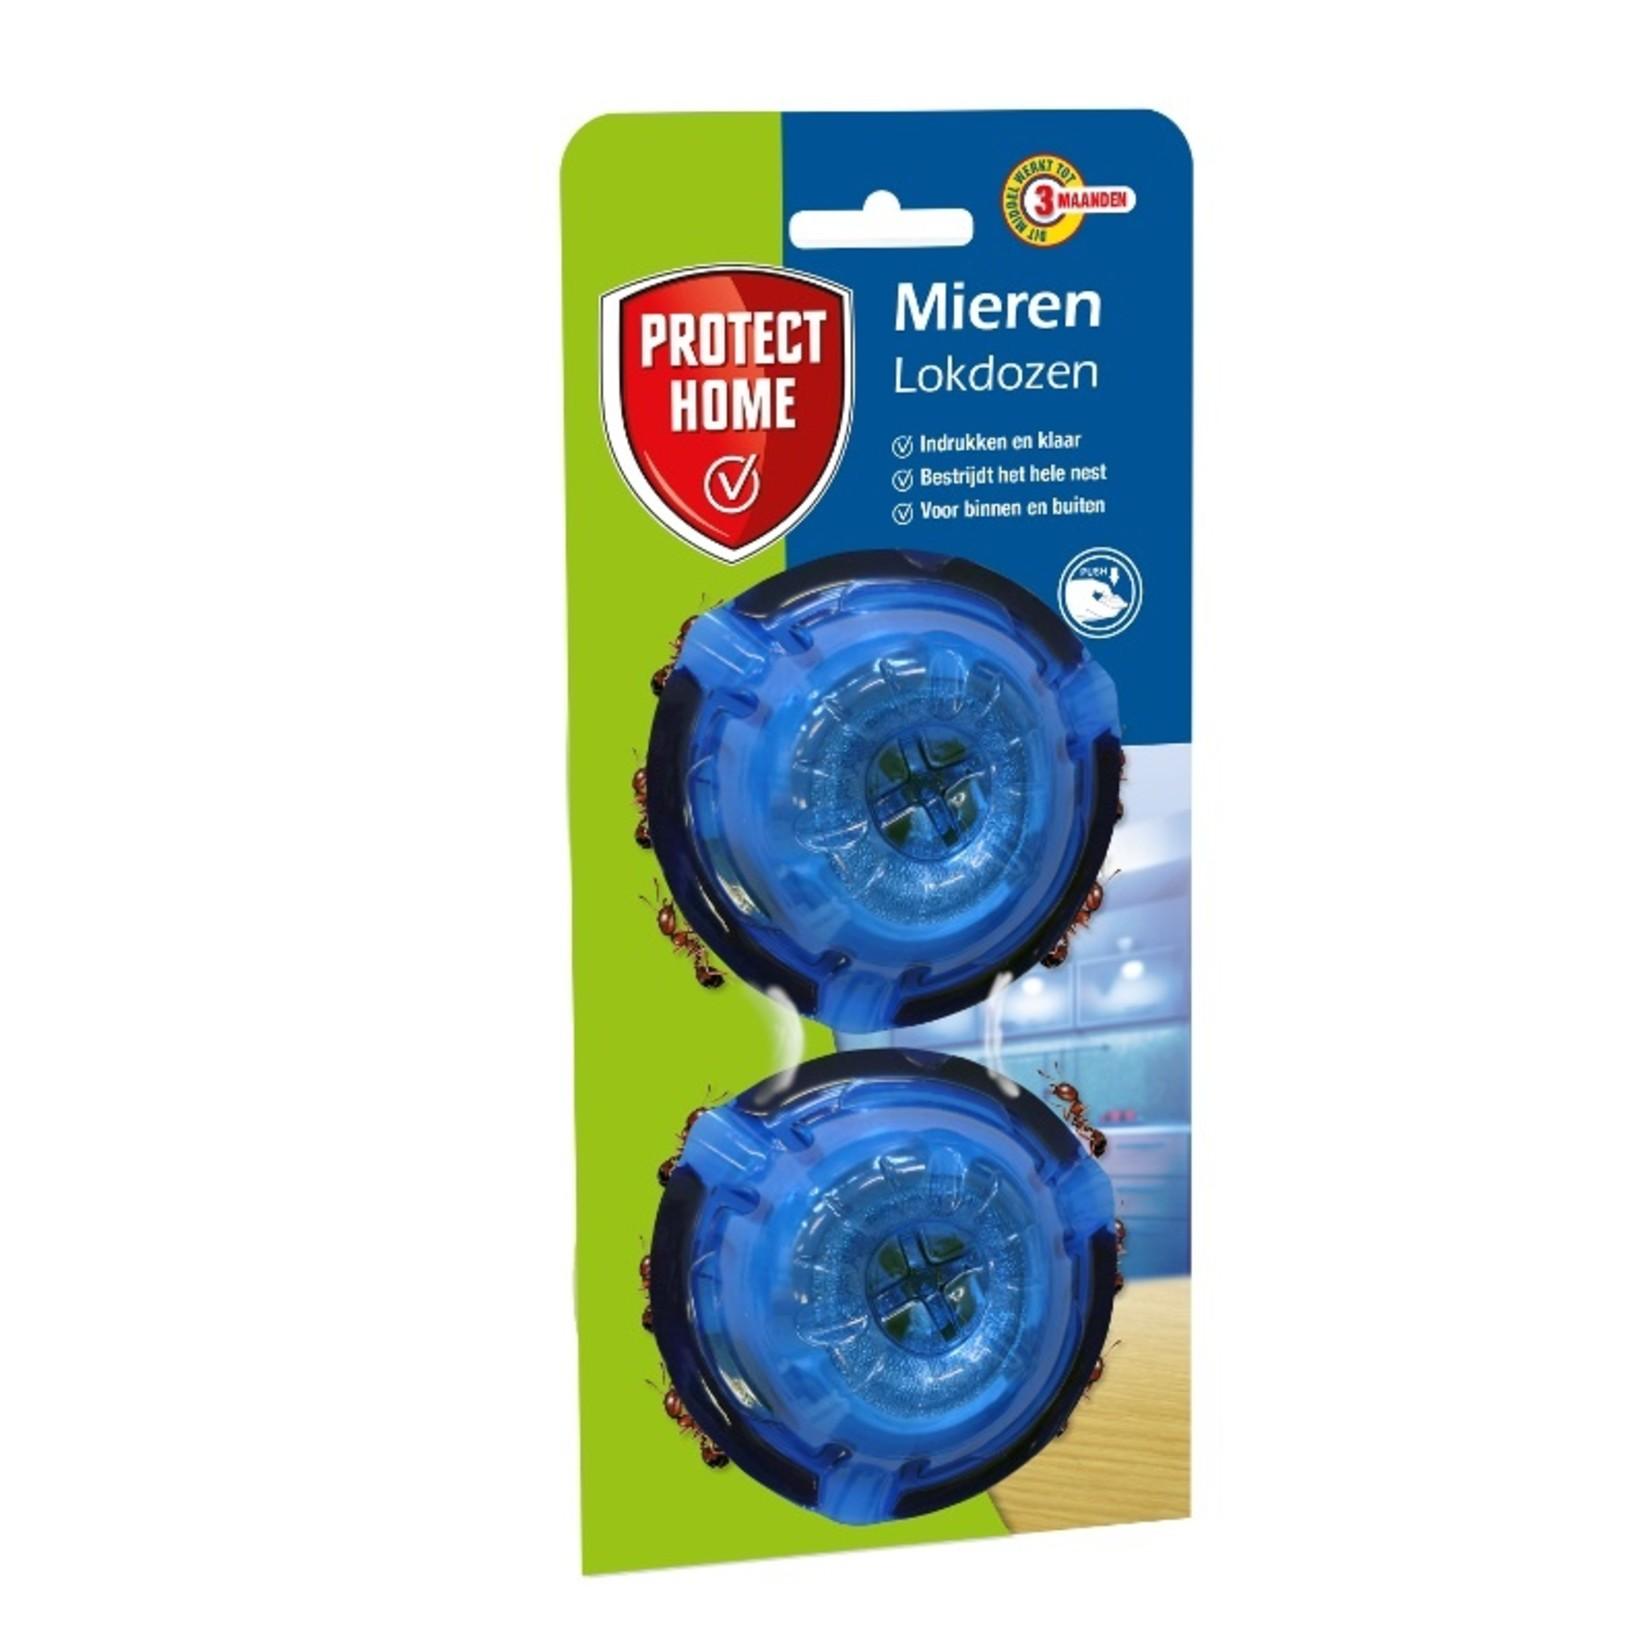 Protect Home Piron pushbox 2 stuks tegen mieren